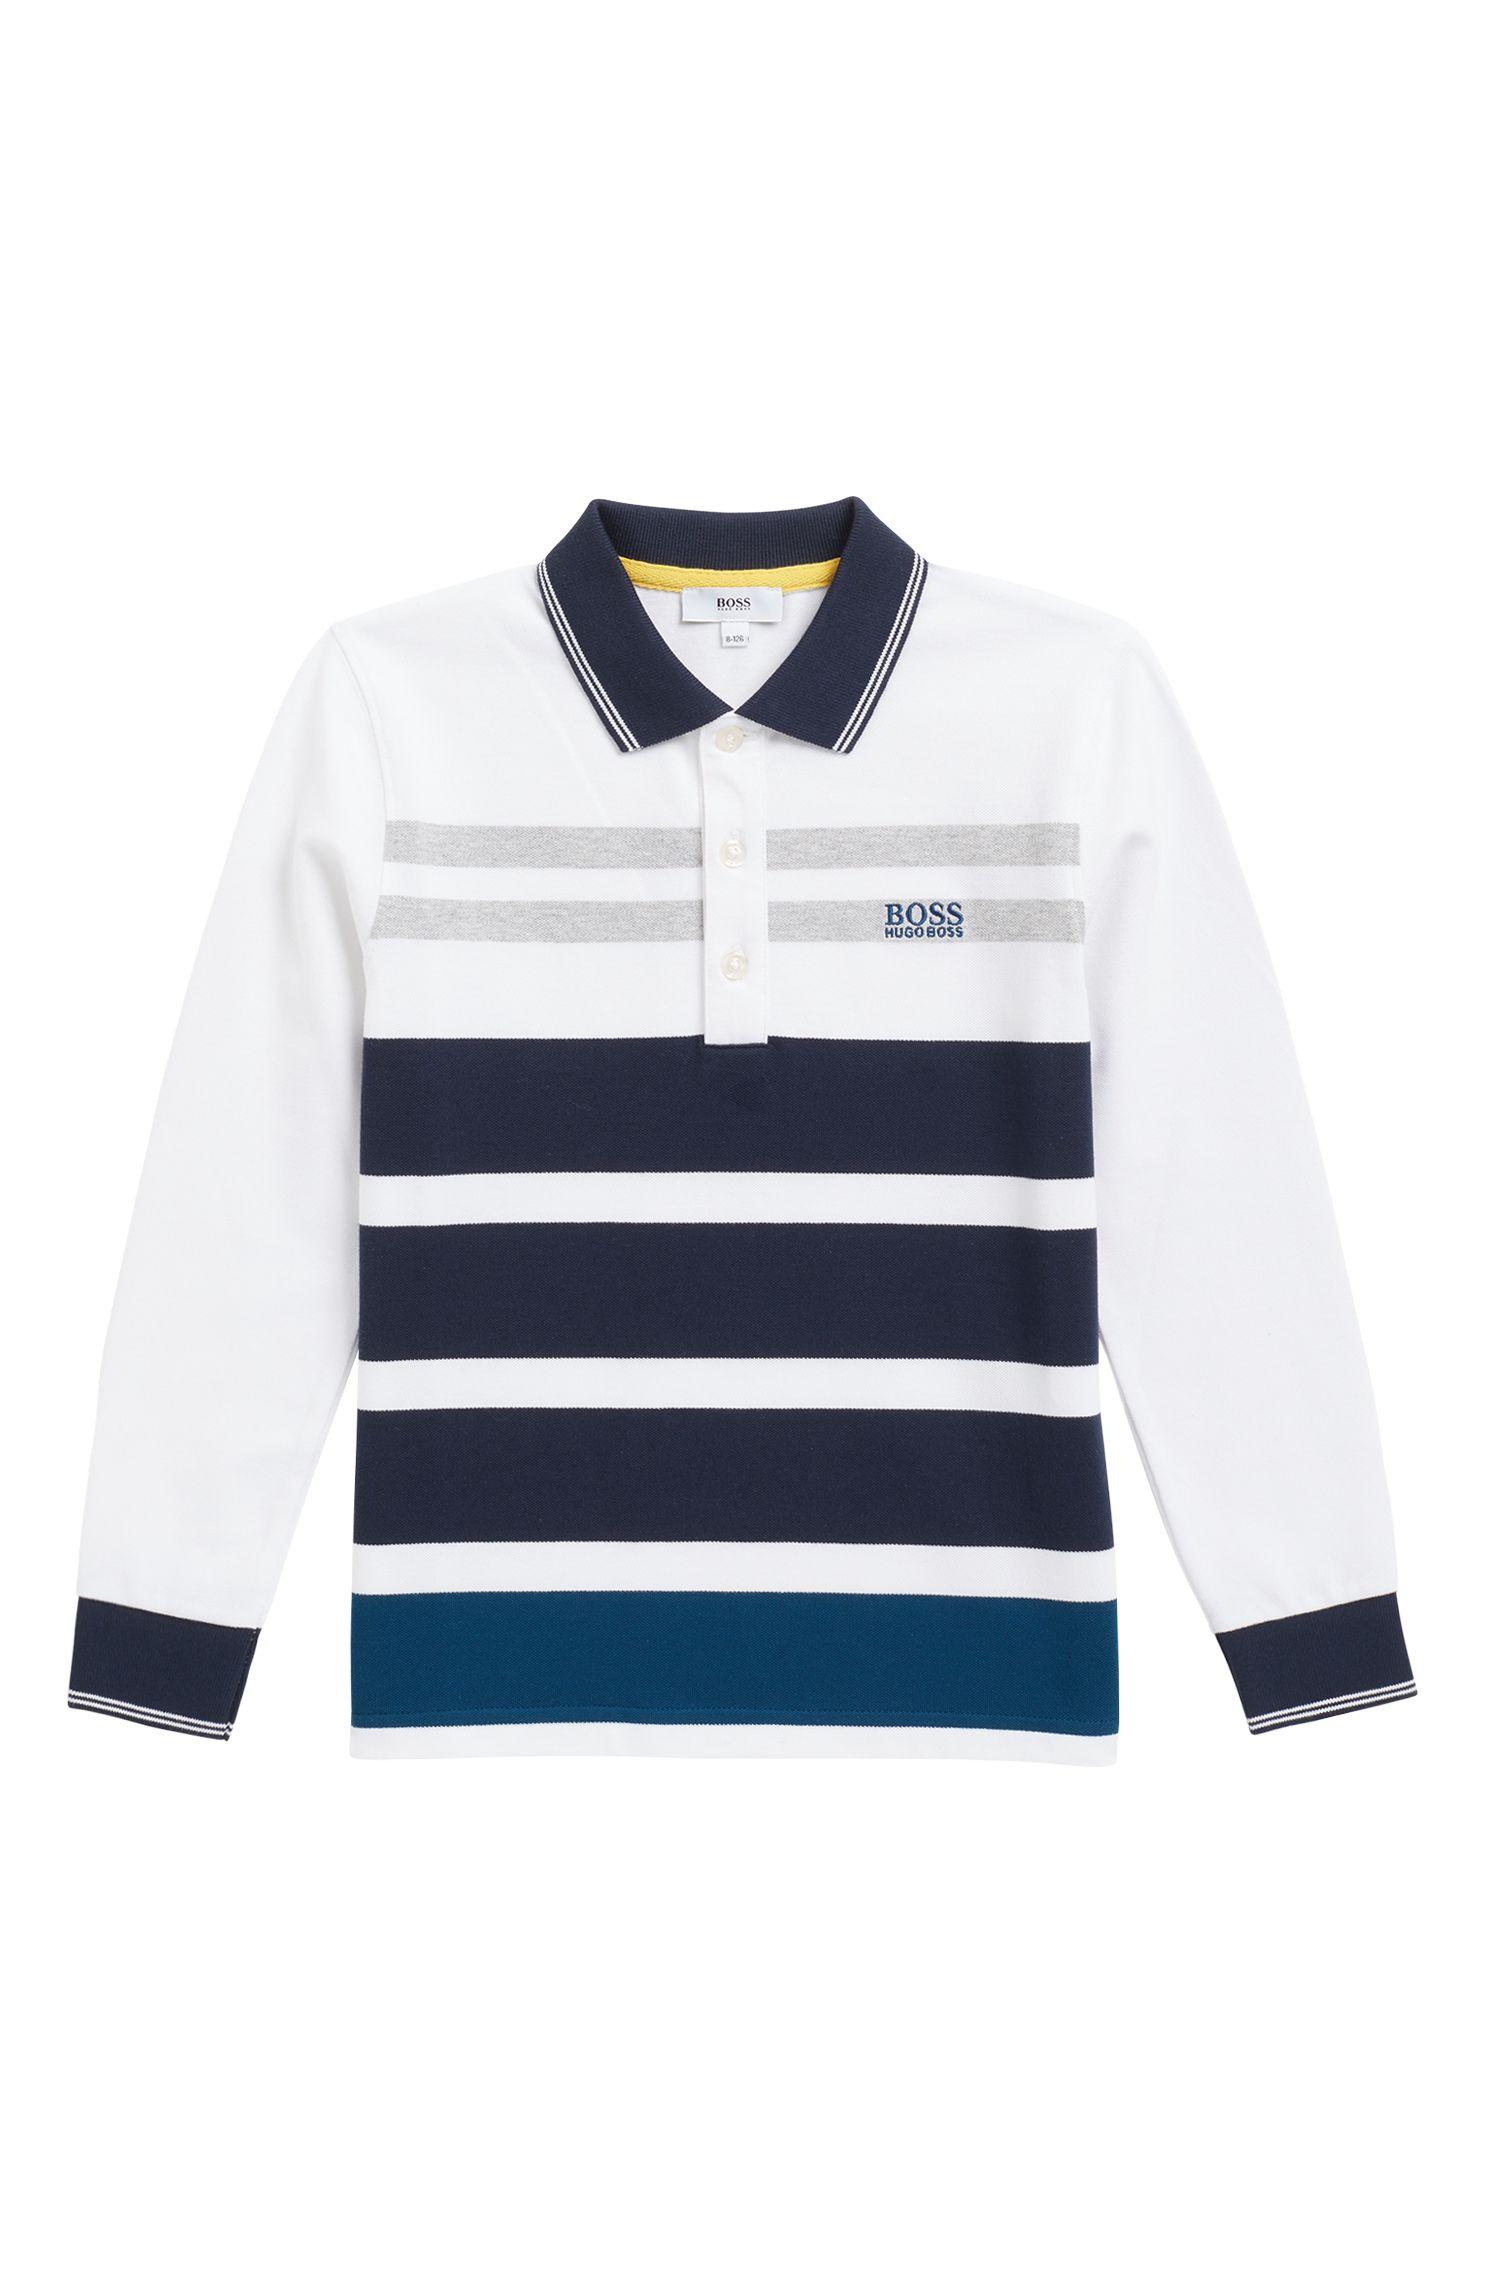 Gestreiftes Kids Longlseeve-Poloshirt aus elastischem Baumwoll-Piqué, Gemustert